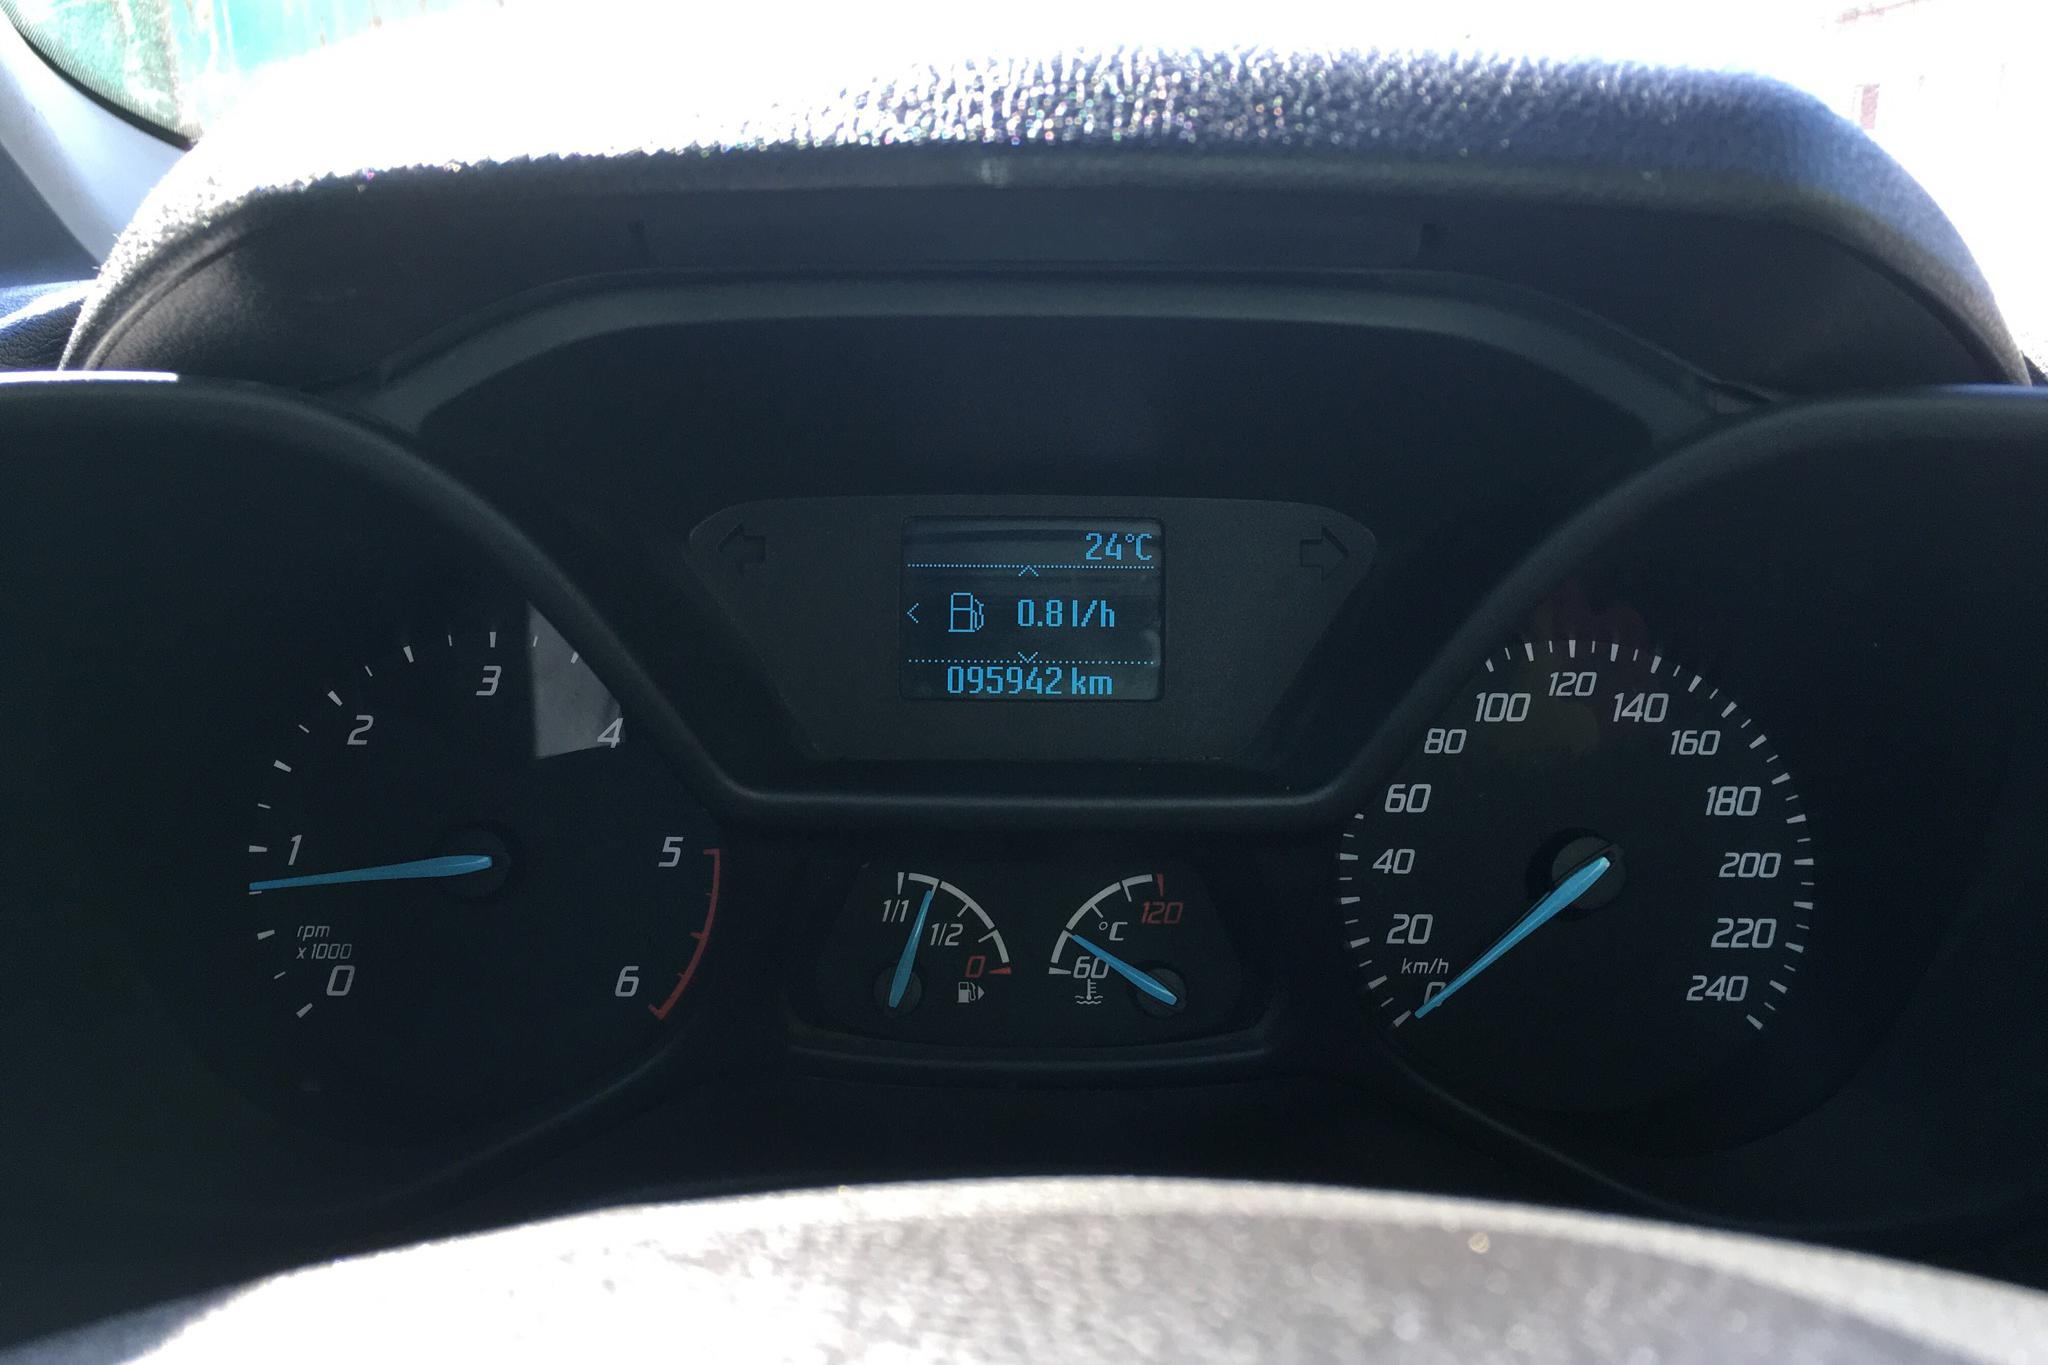 Ford Transit Connect 1.6 TDCi (95hk) - 9 594 mil - Manuell - vit - 2014